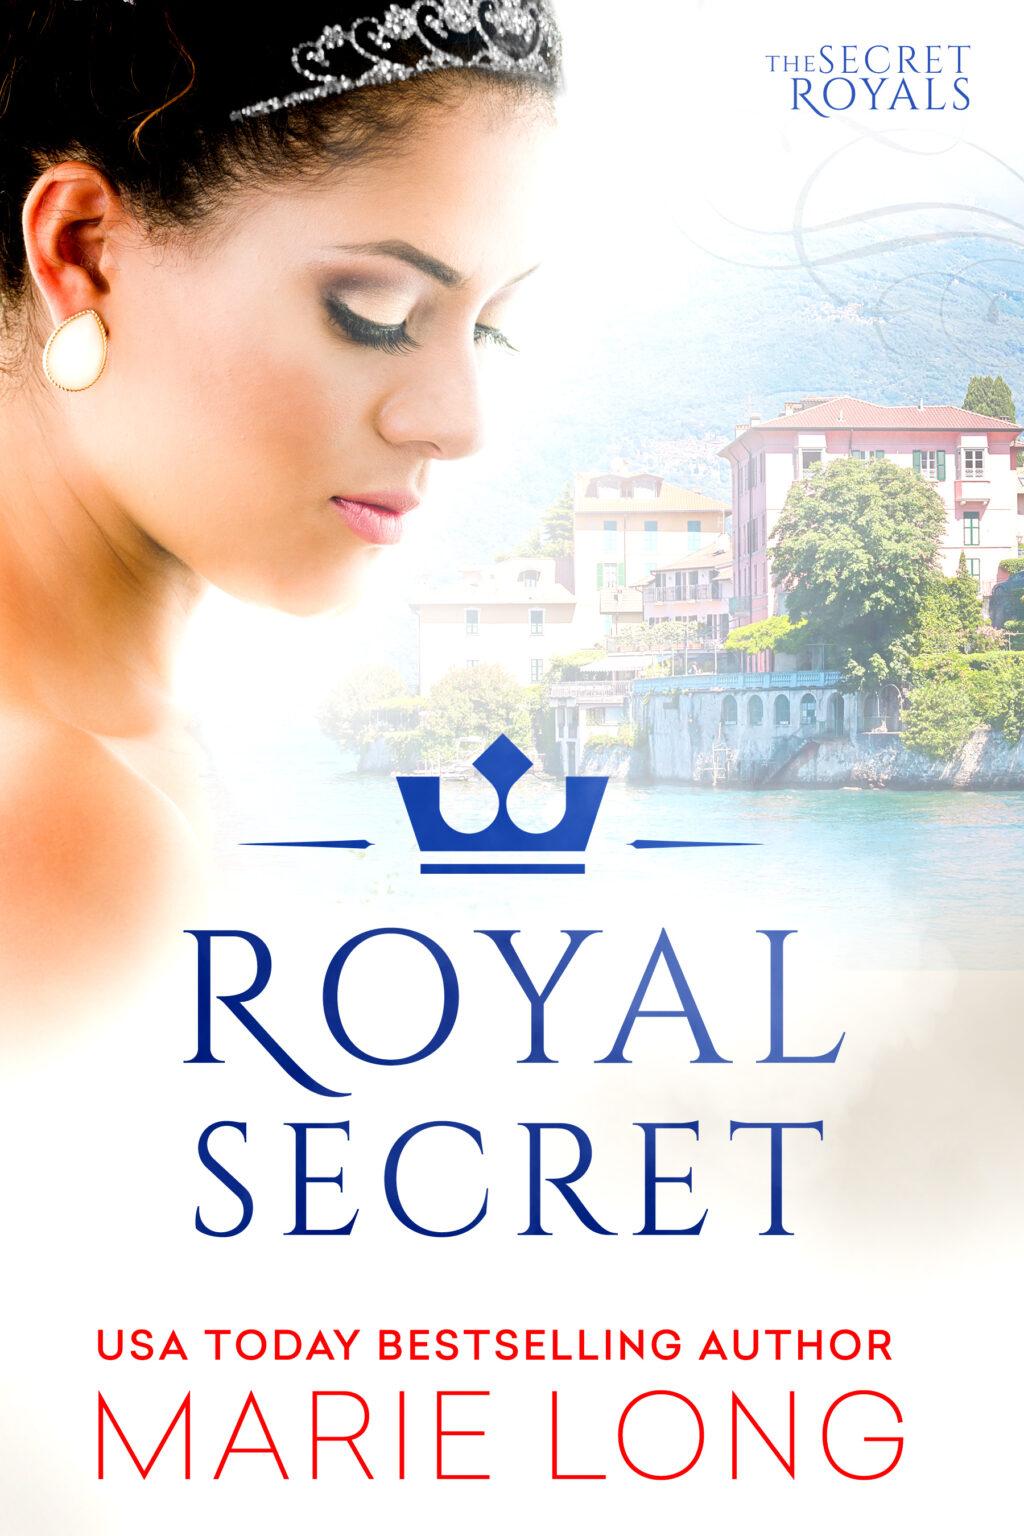 Royal Secret (The Secret Royals, book 2)